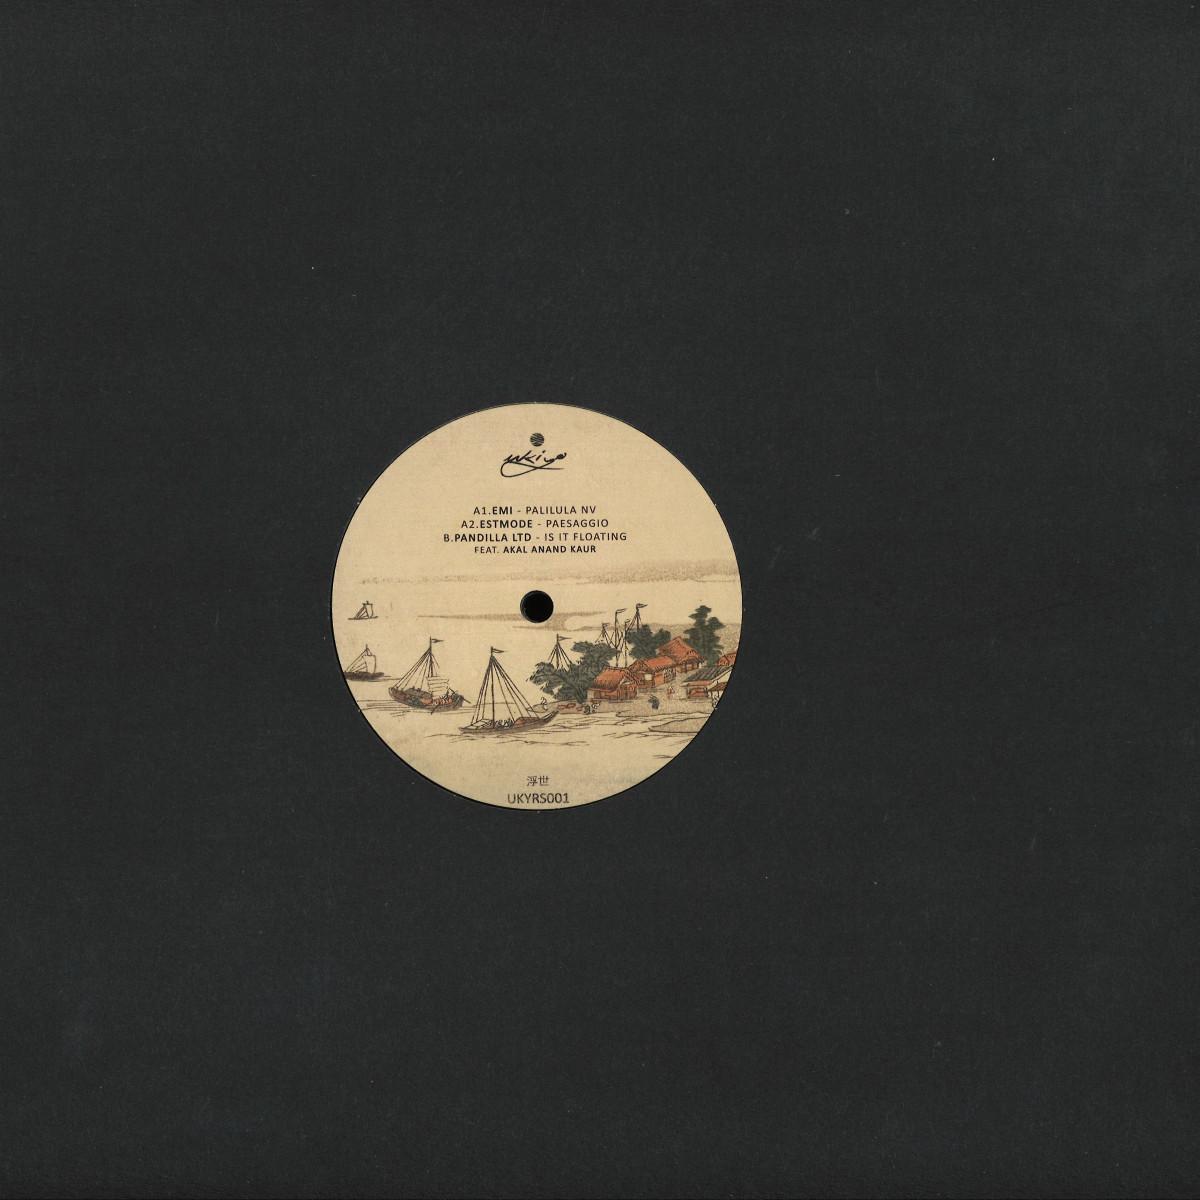 Various-Artists-Retro-Series-Vol.-1-Ukiyo-Music-02